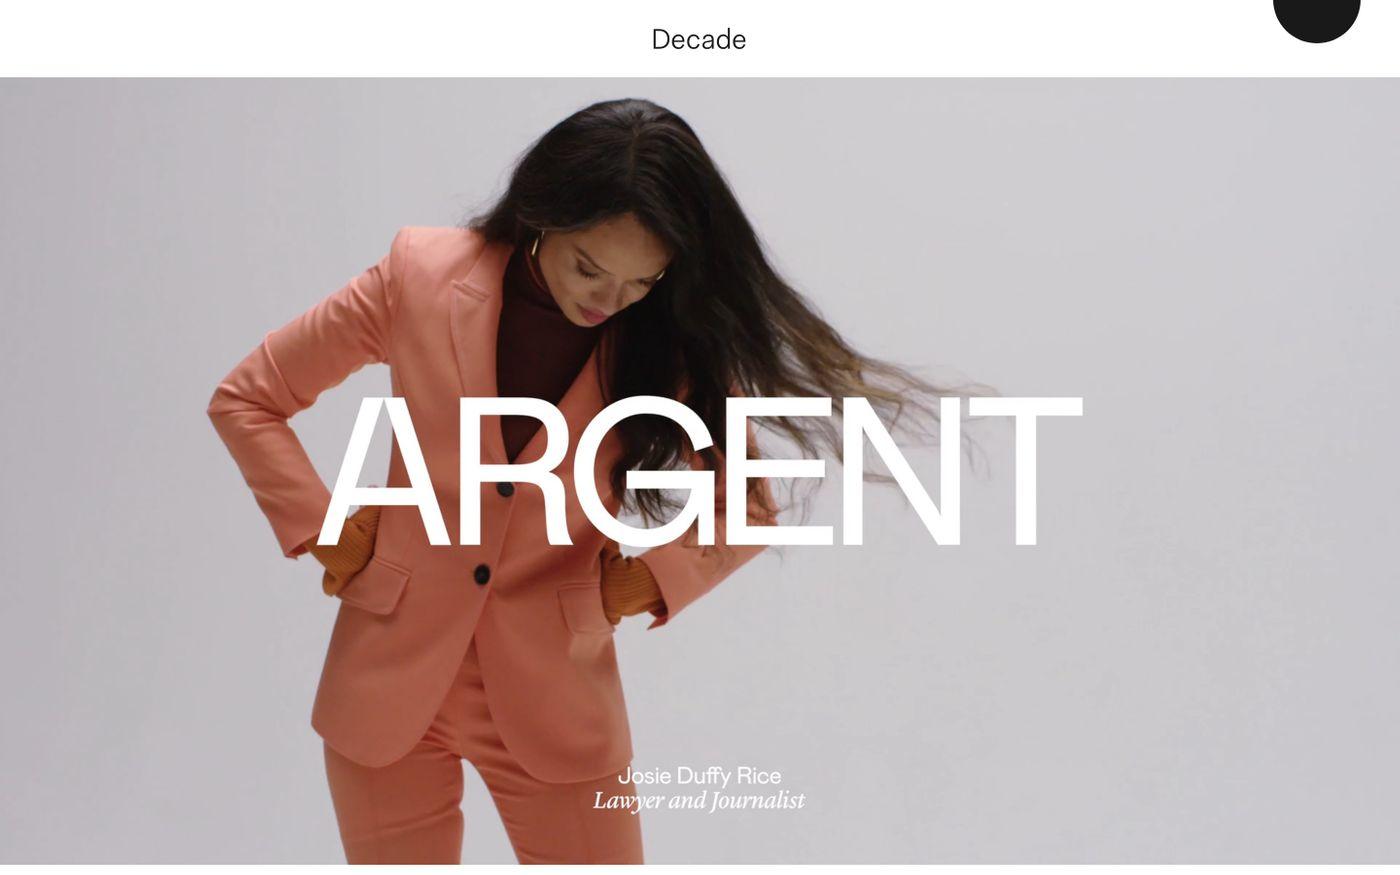 Screenshot of Decade website